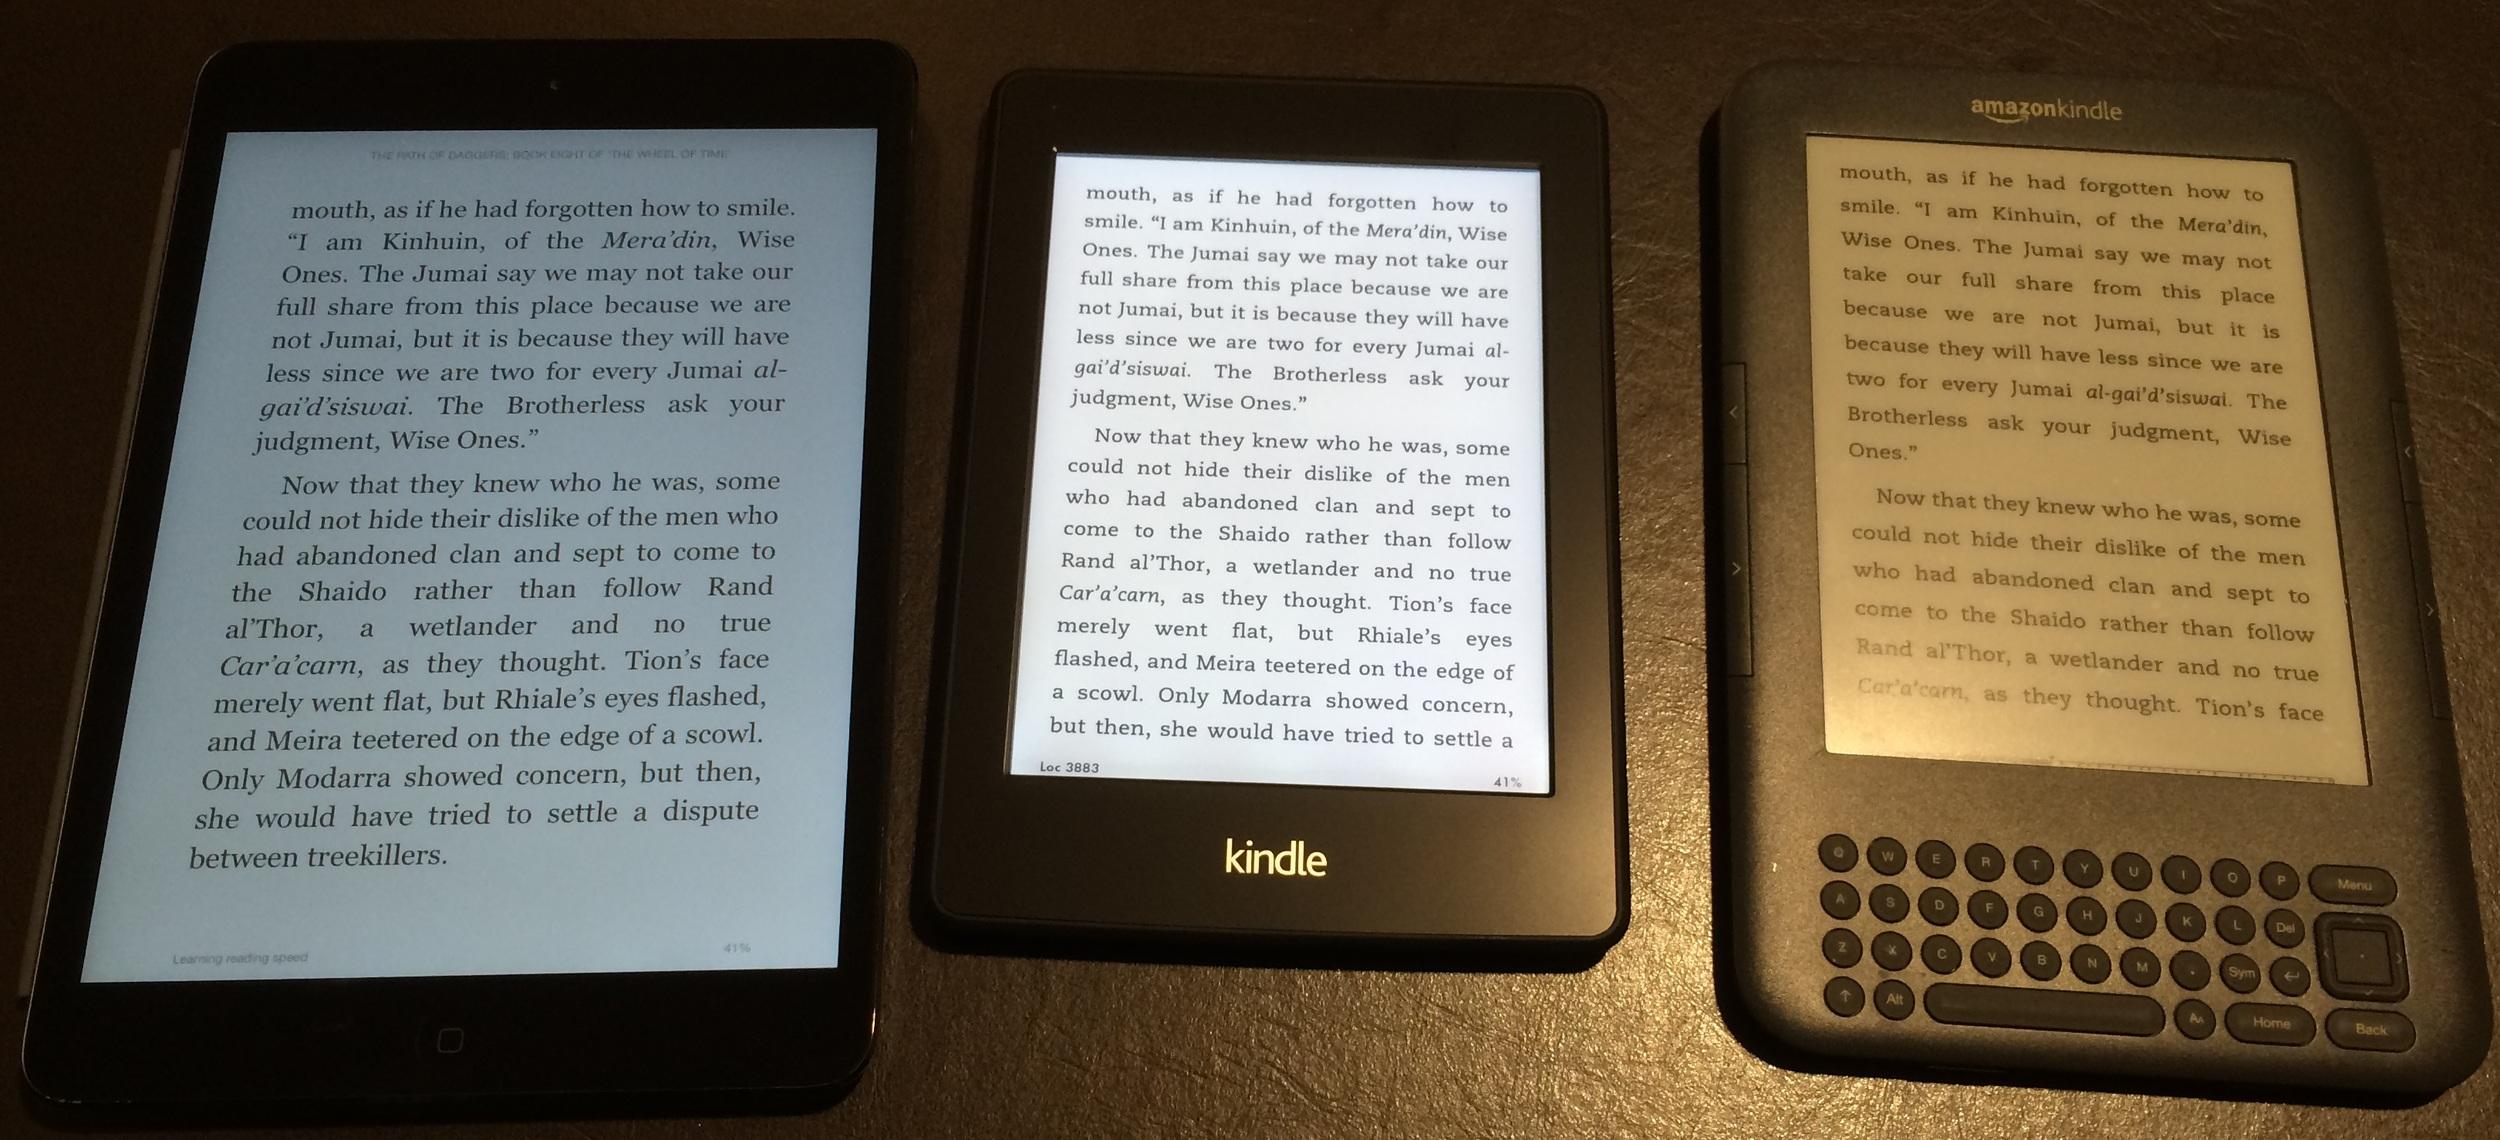 iPad mini (left), Kindle Paperwhite (center), Kindle Keyboard (right)